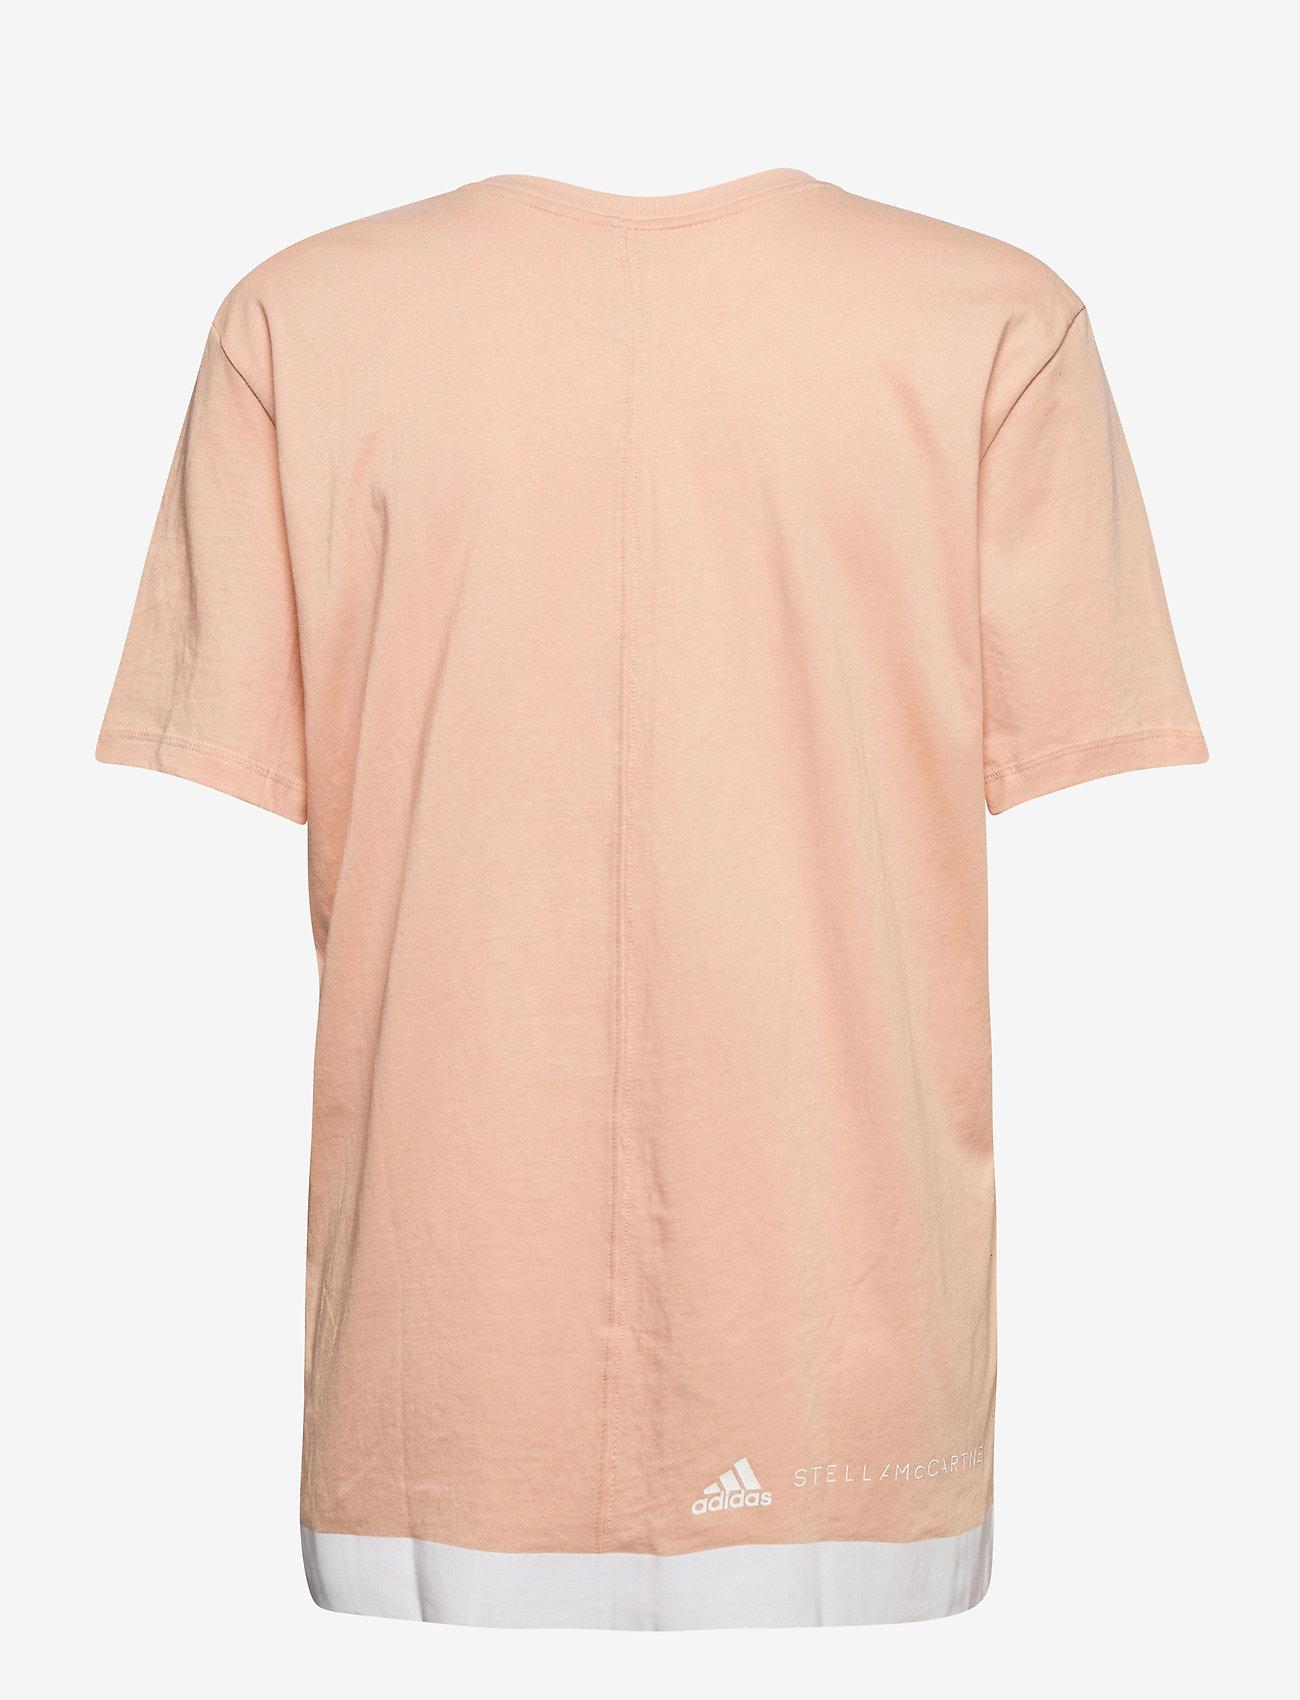 adidas by Stella McCartney - COTTON TEE - t-shirts - sofpow - 1